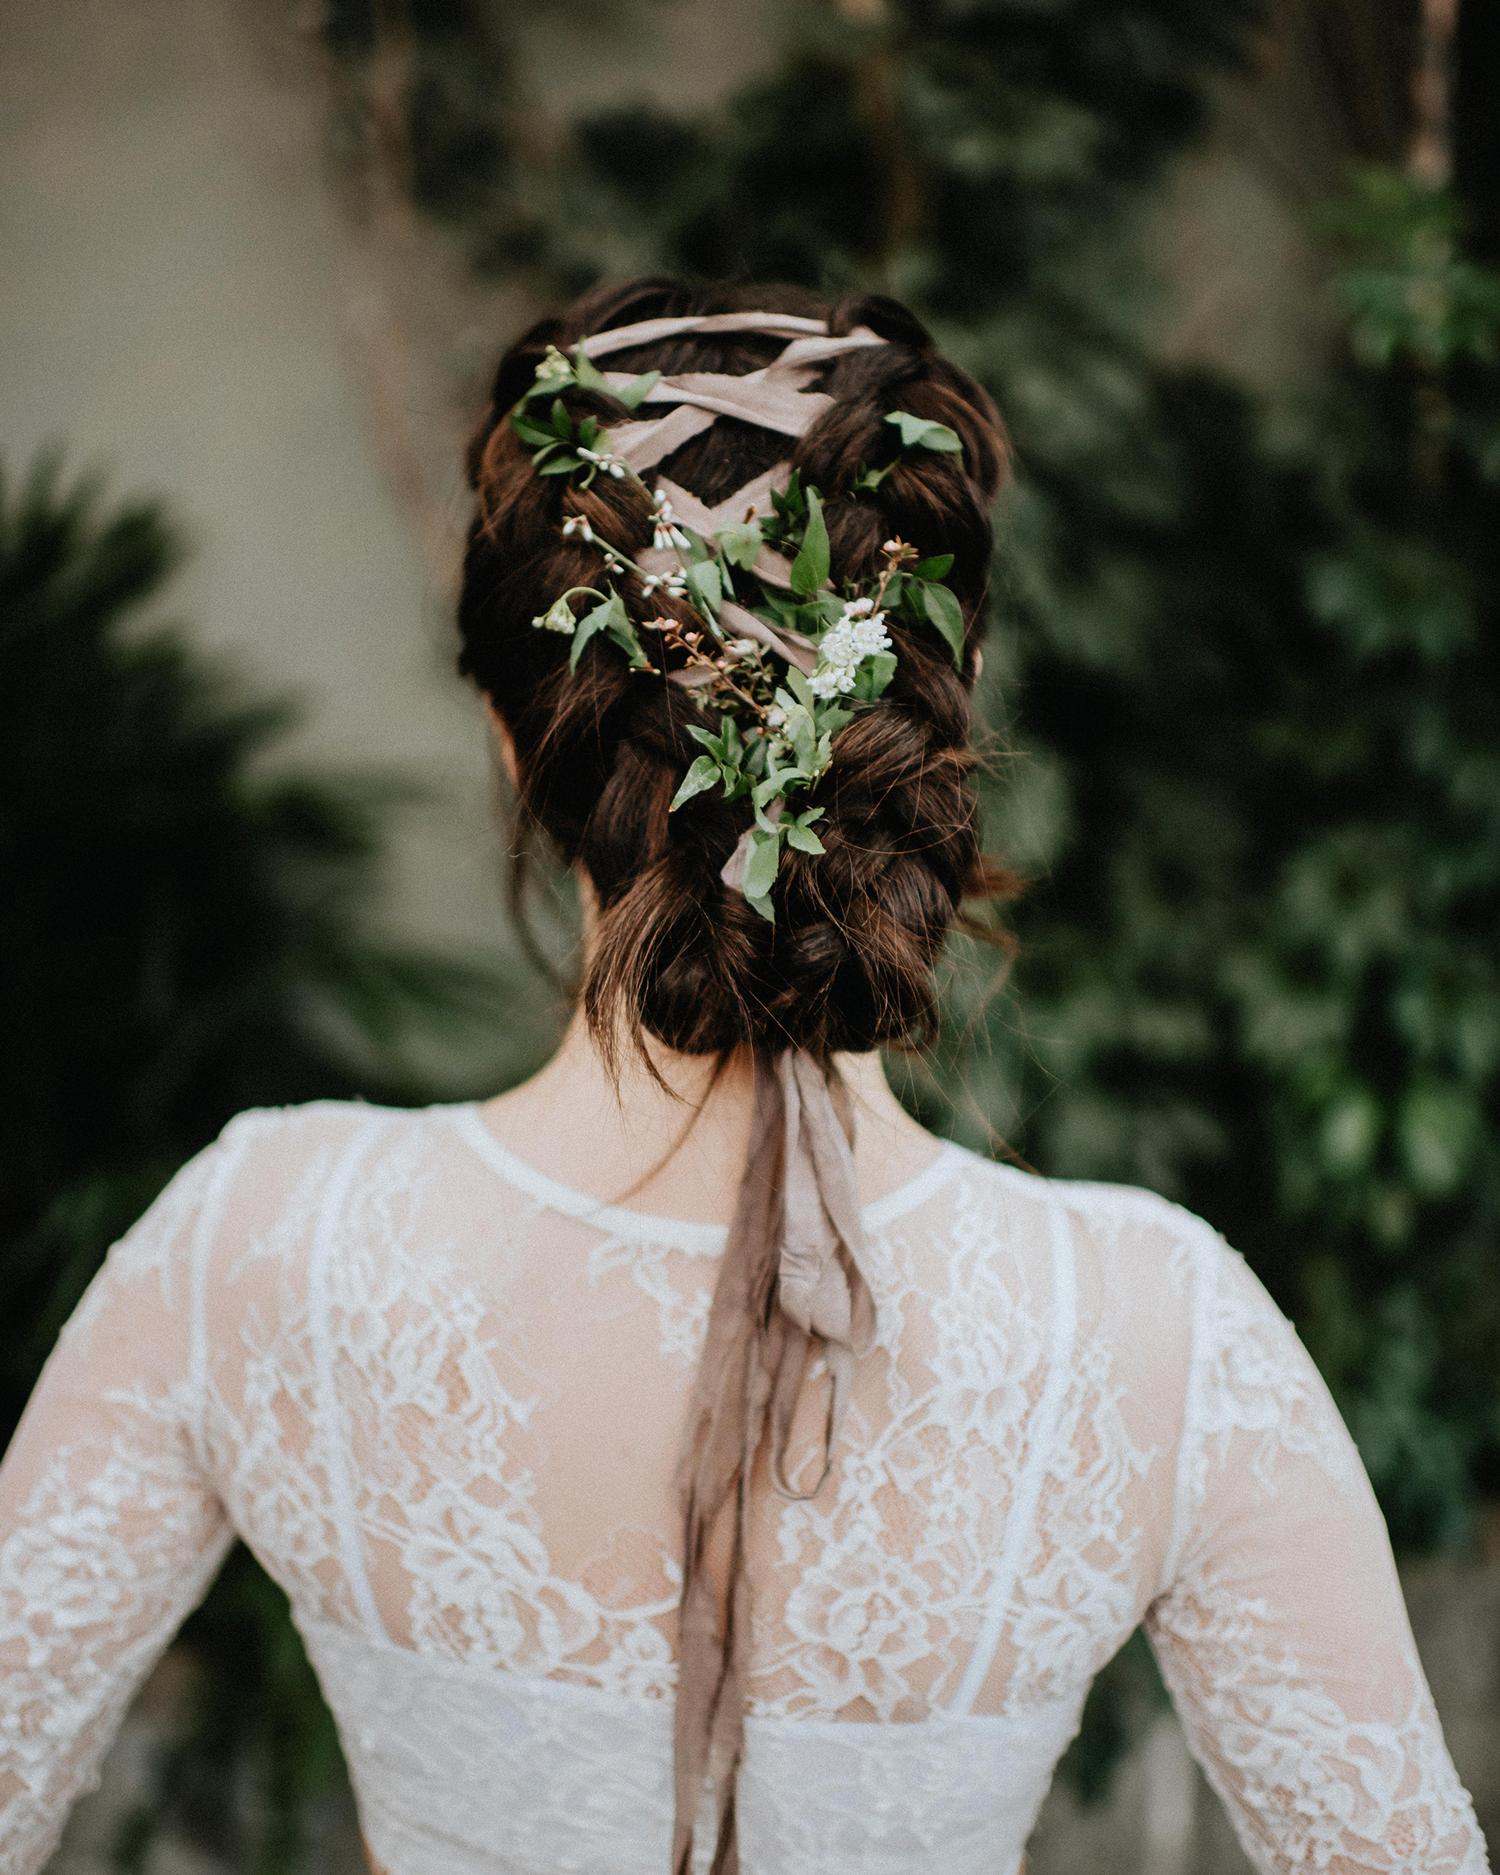 ribbon wedding ideas ribbon and flowers braided into brides hair